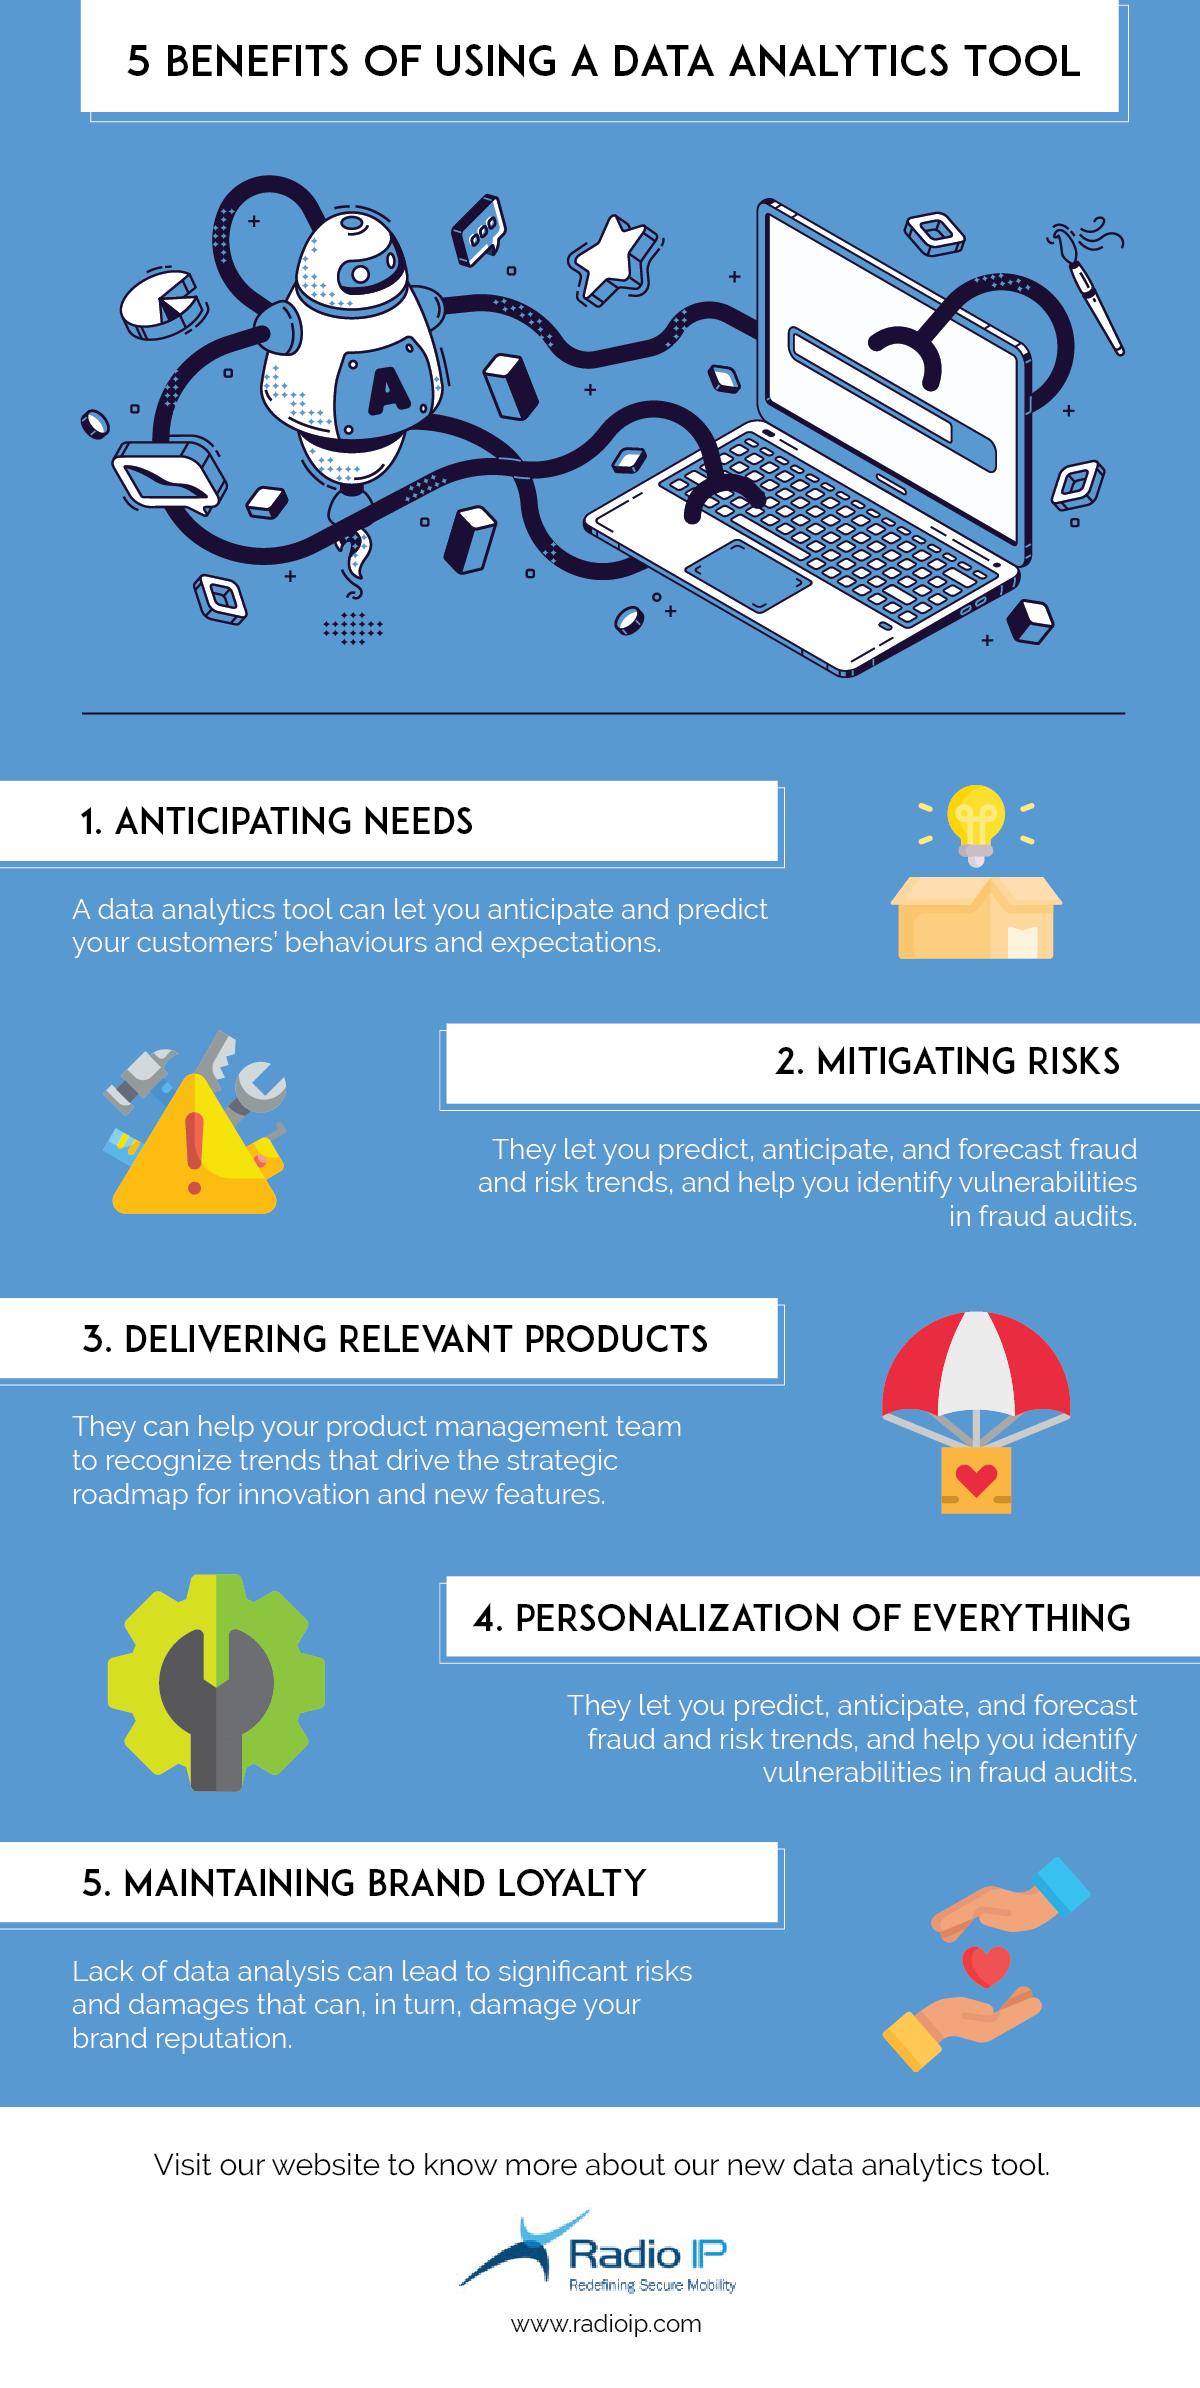 Benefits of Using A Data Analytics Tool